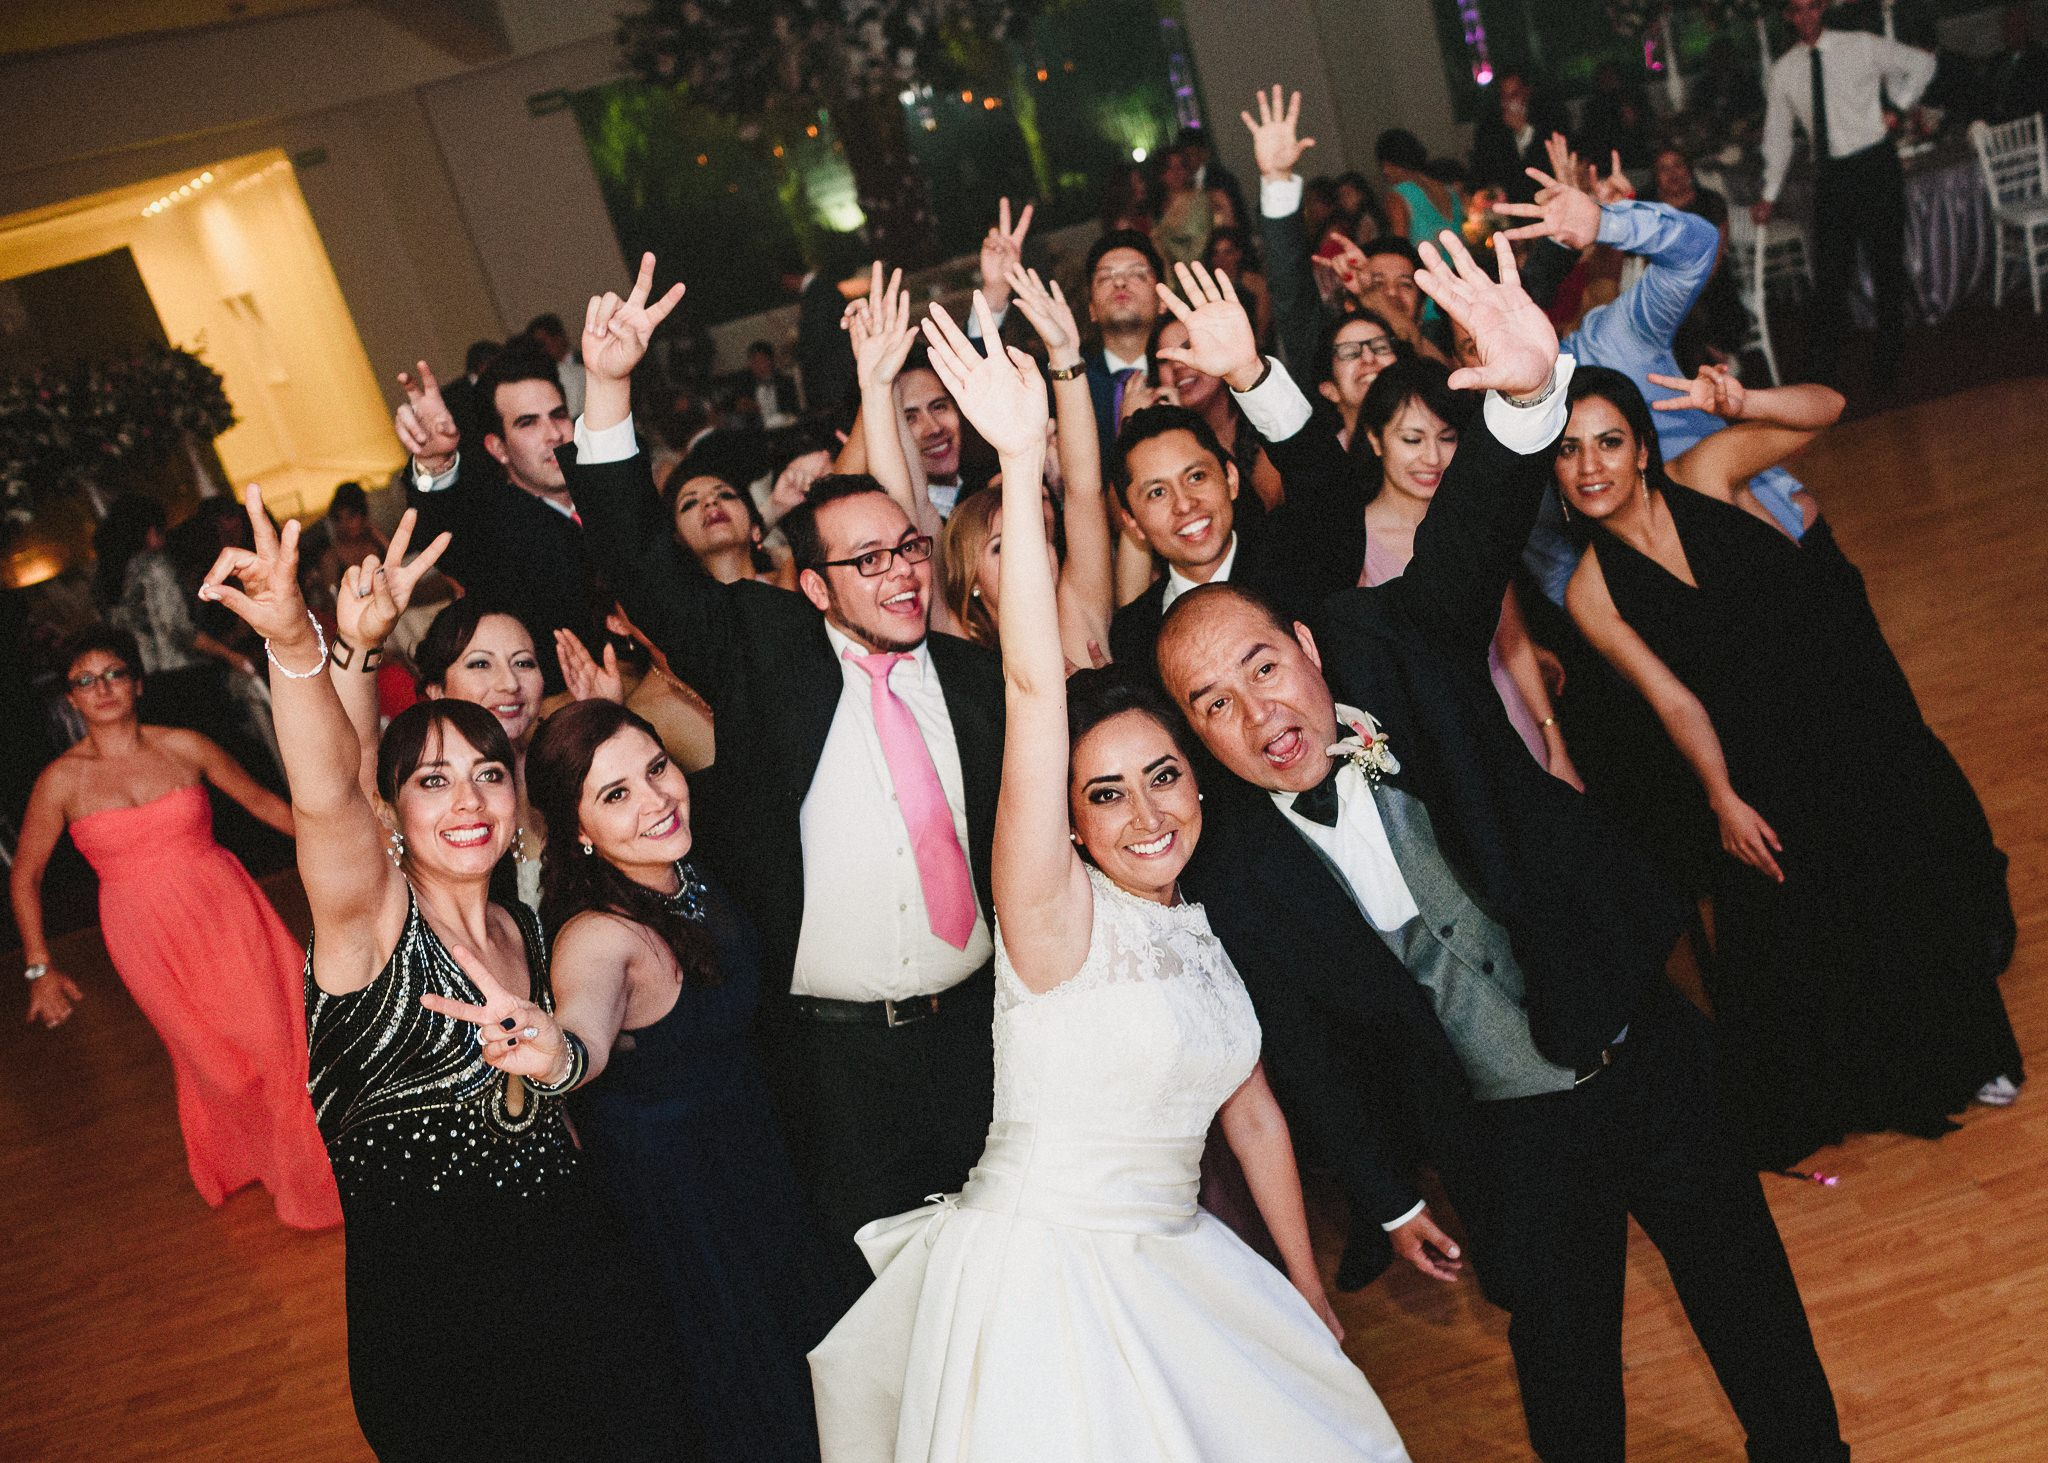 Wedding-Boda-Tulancingo-Hidalgo-Salon-Essenzia-Luis-Houdin-88-film